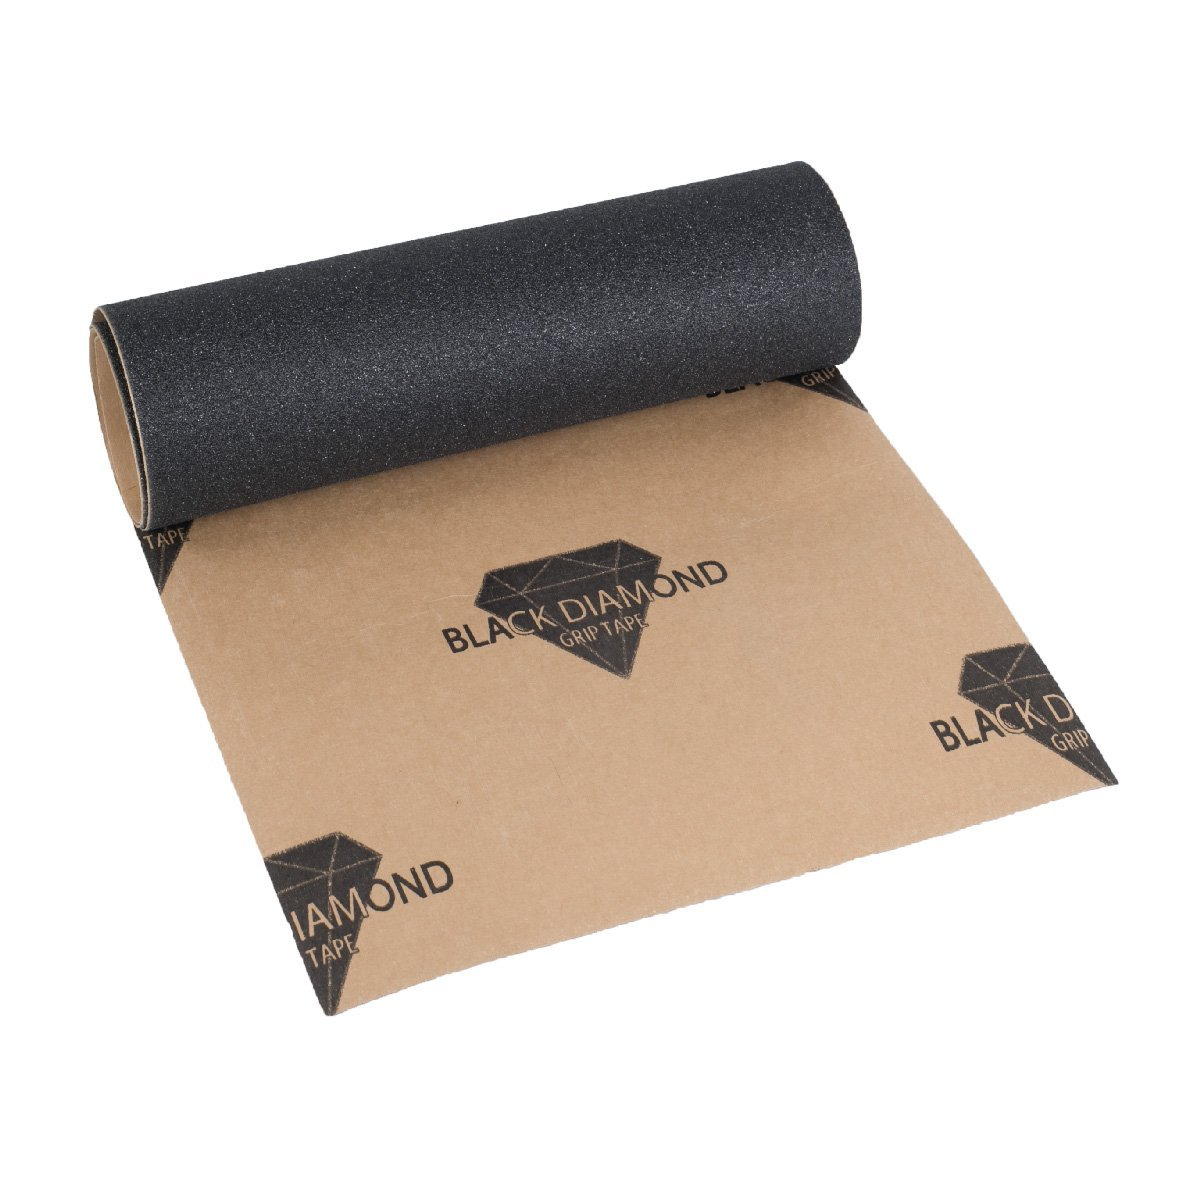 Skateboard-Griptape-von-Black-Diamond-1-Lage-23x84cm-premium-Griptape-selbstklebend